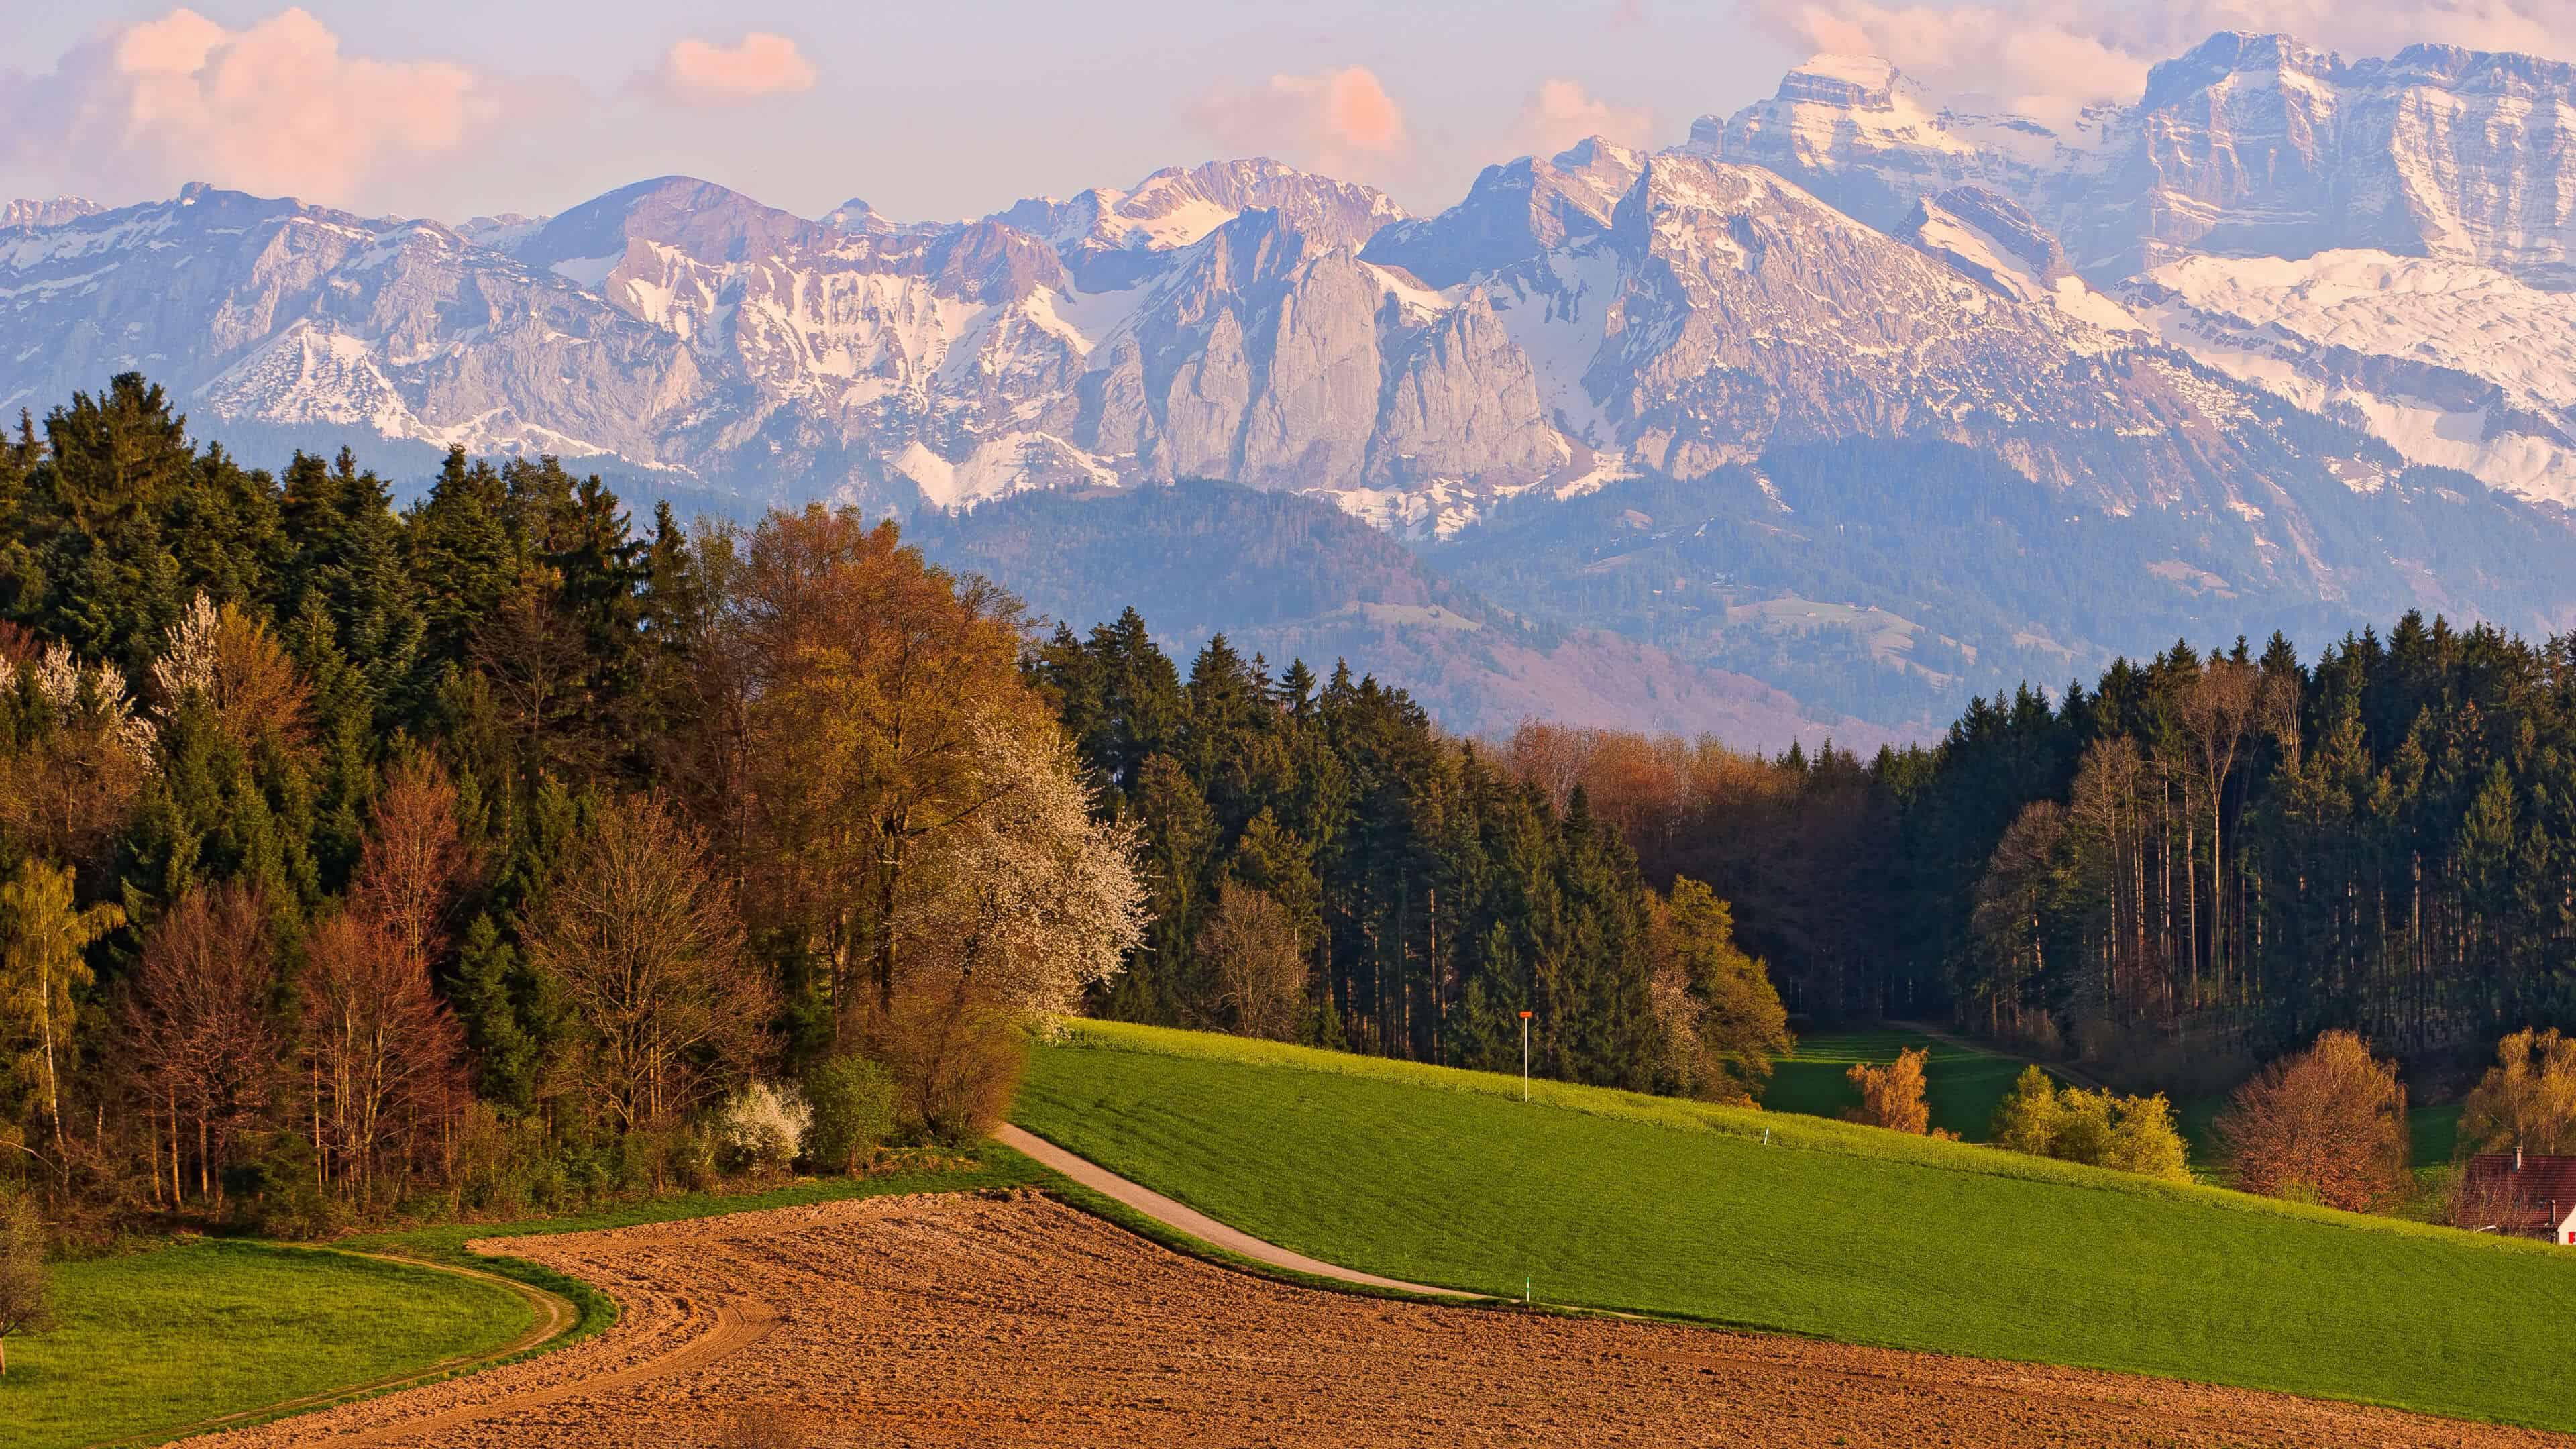 autumn in switzerland uhd 4k wallpaper